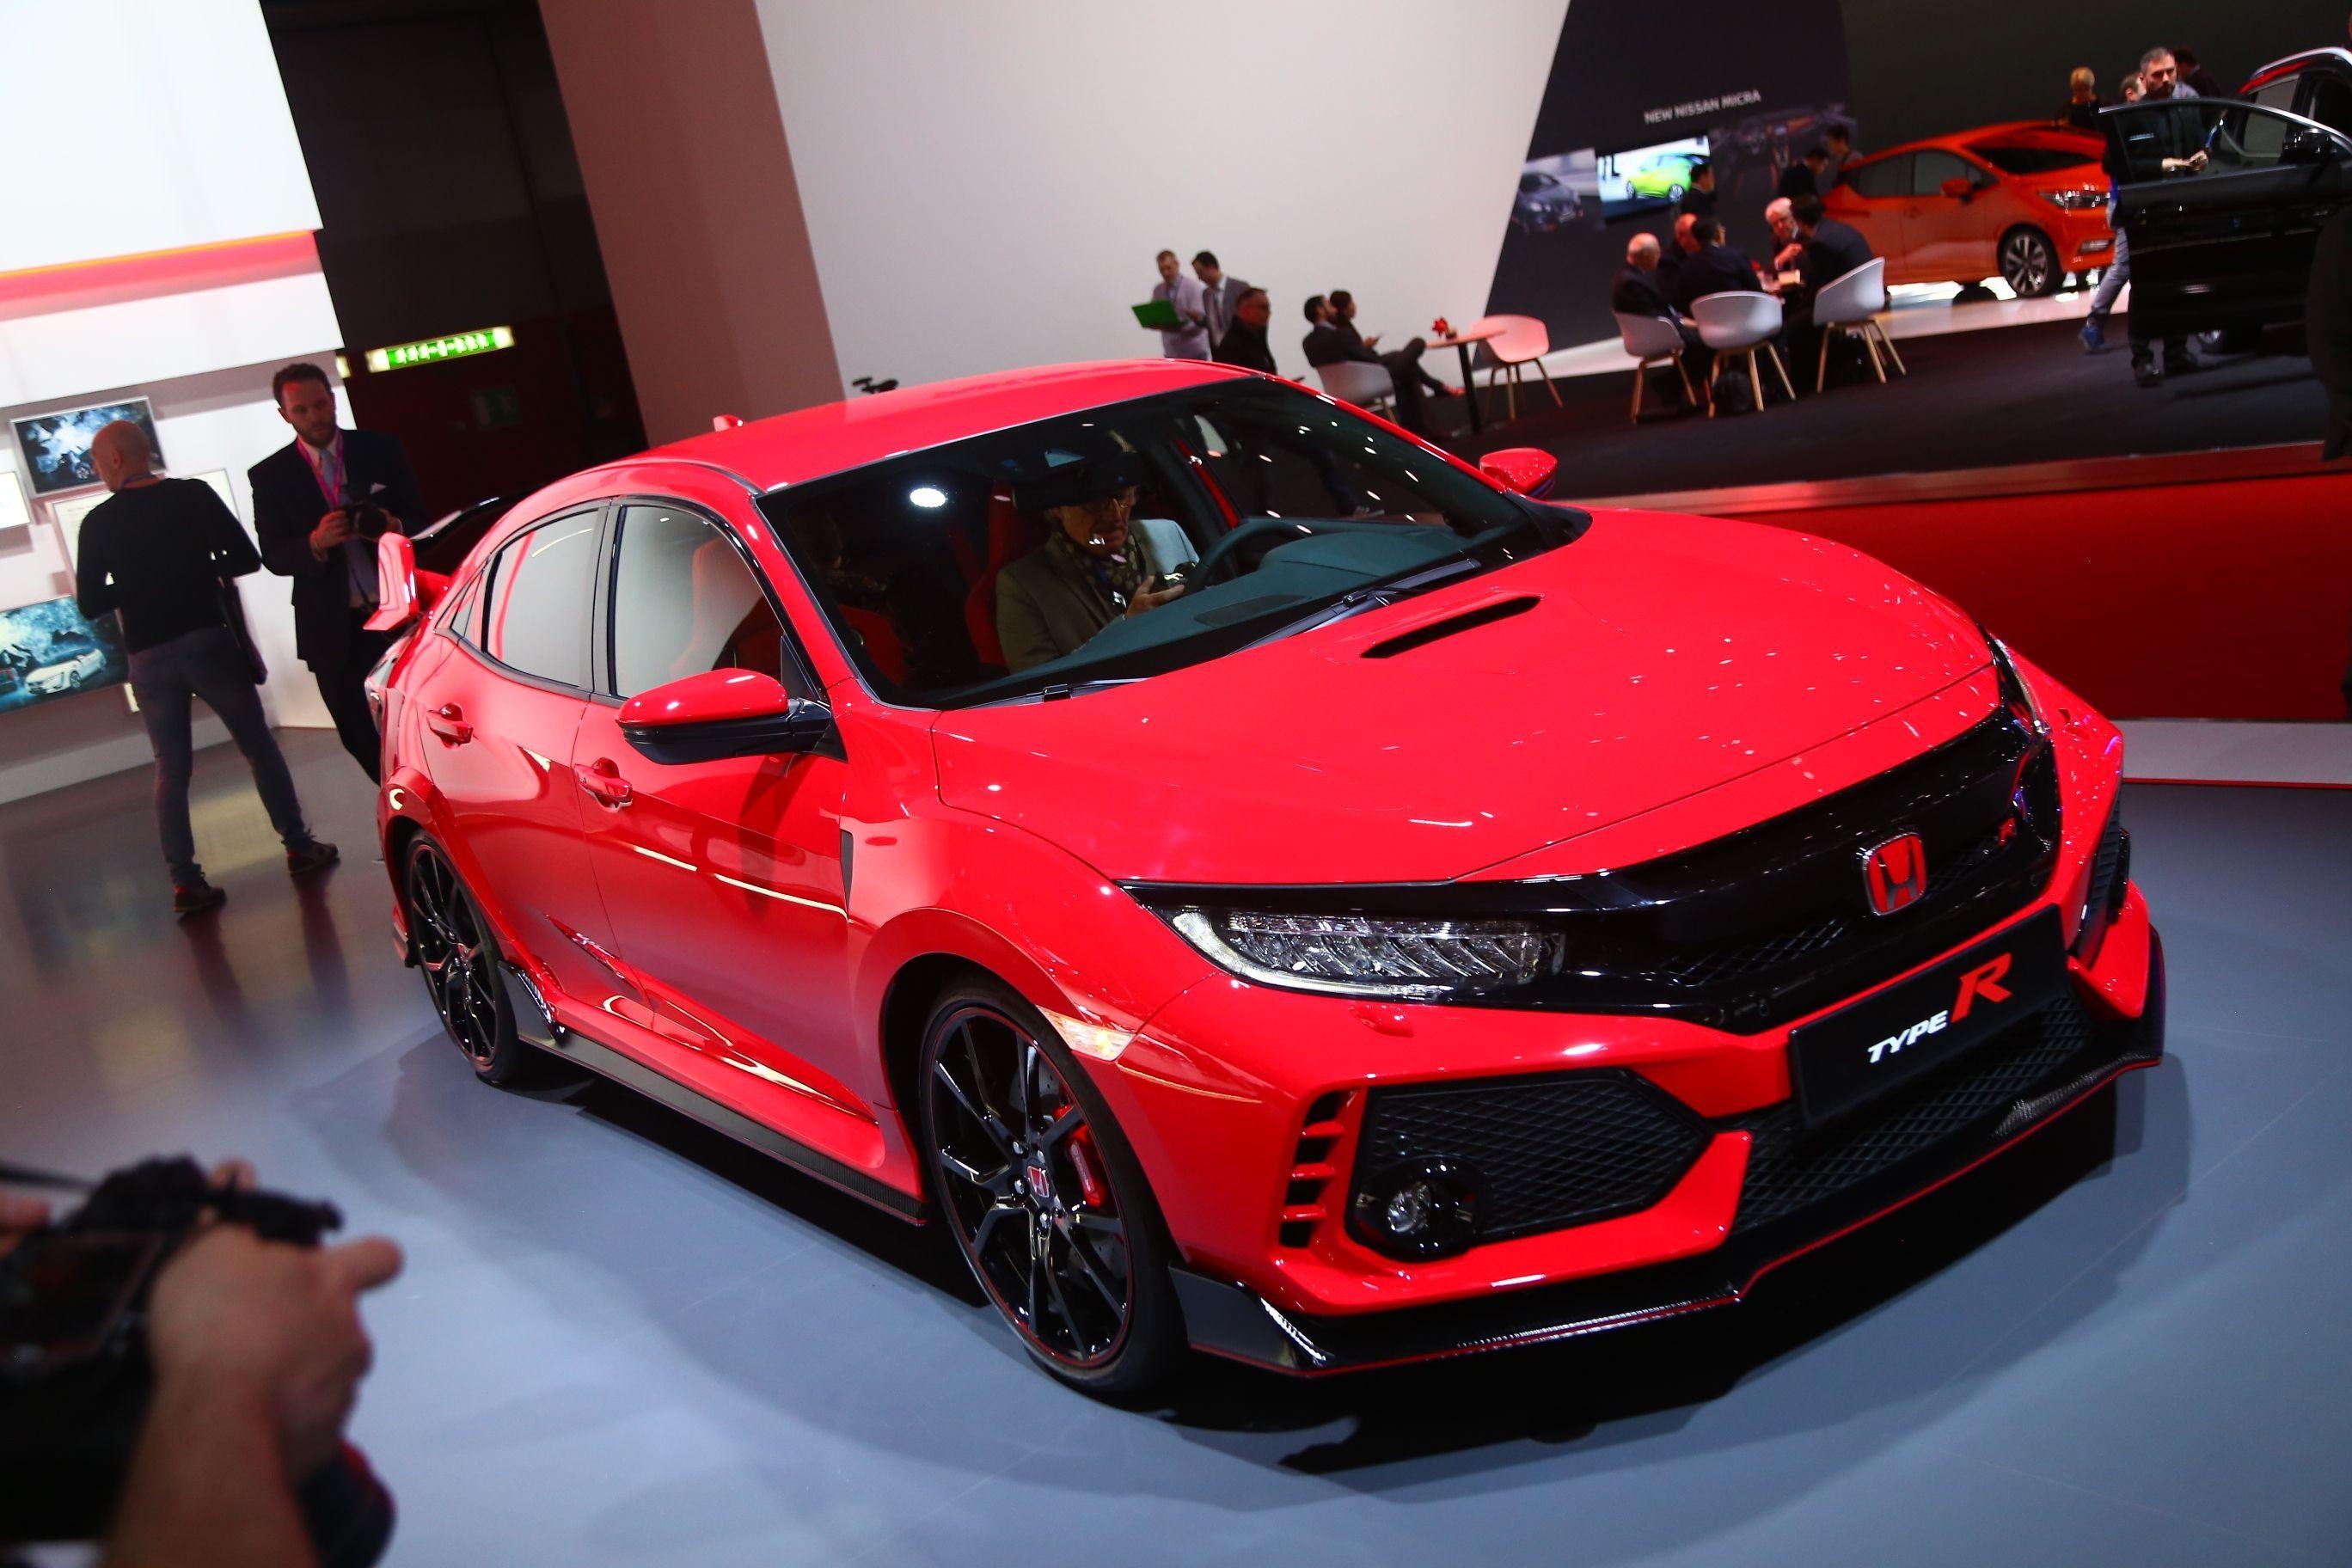 2019 Honda Civic Type R Exterior Cars New Honda Civic Hatchback